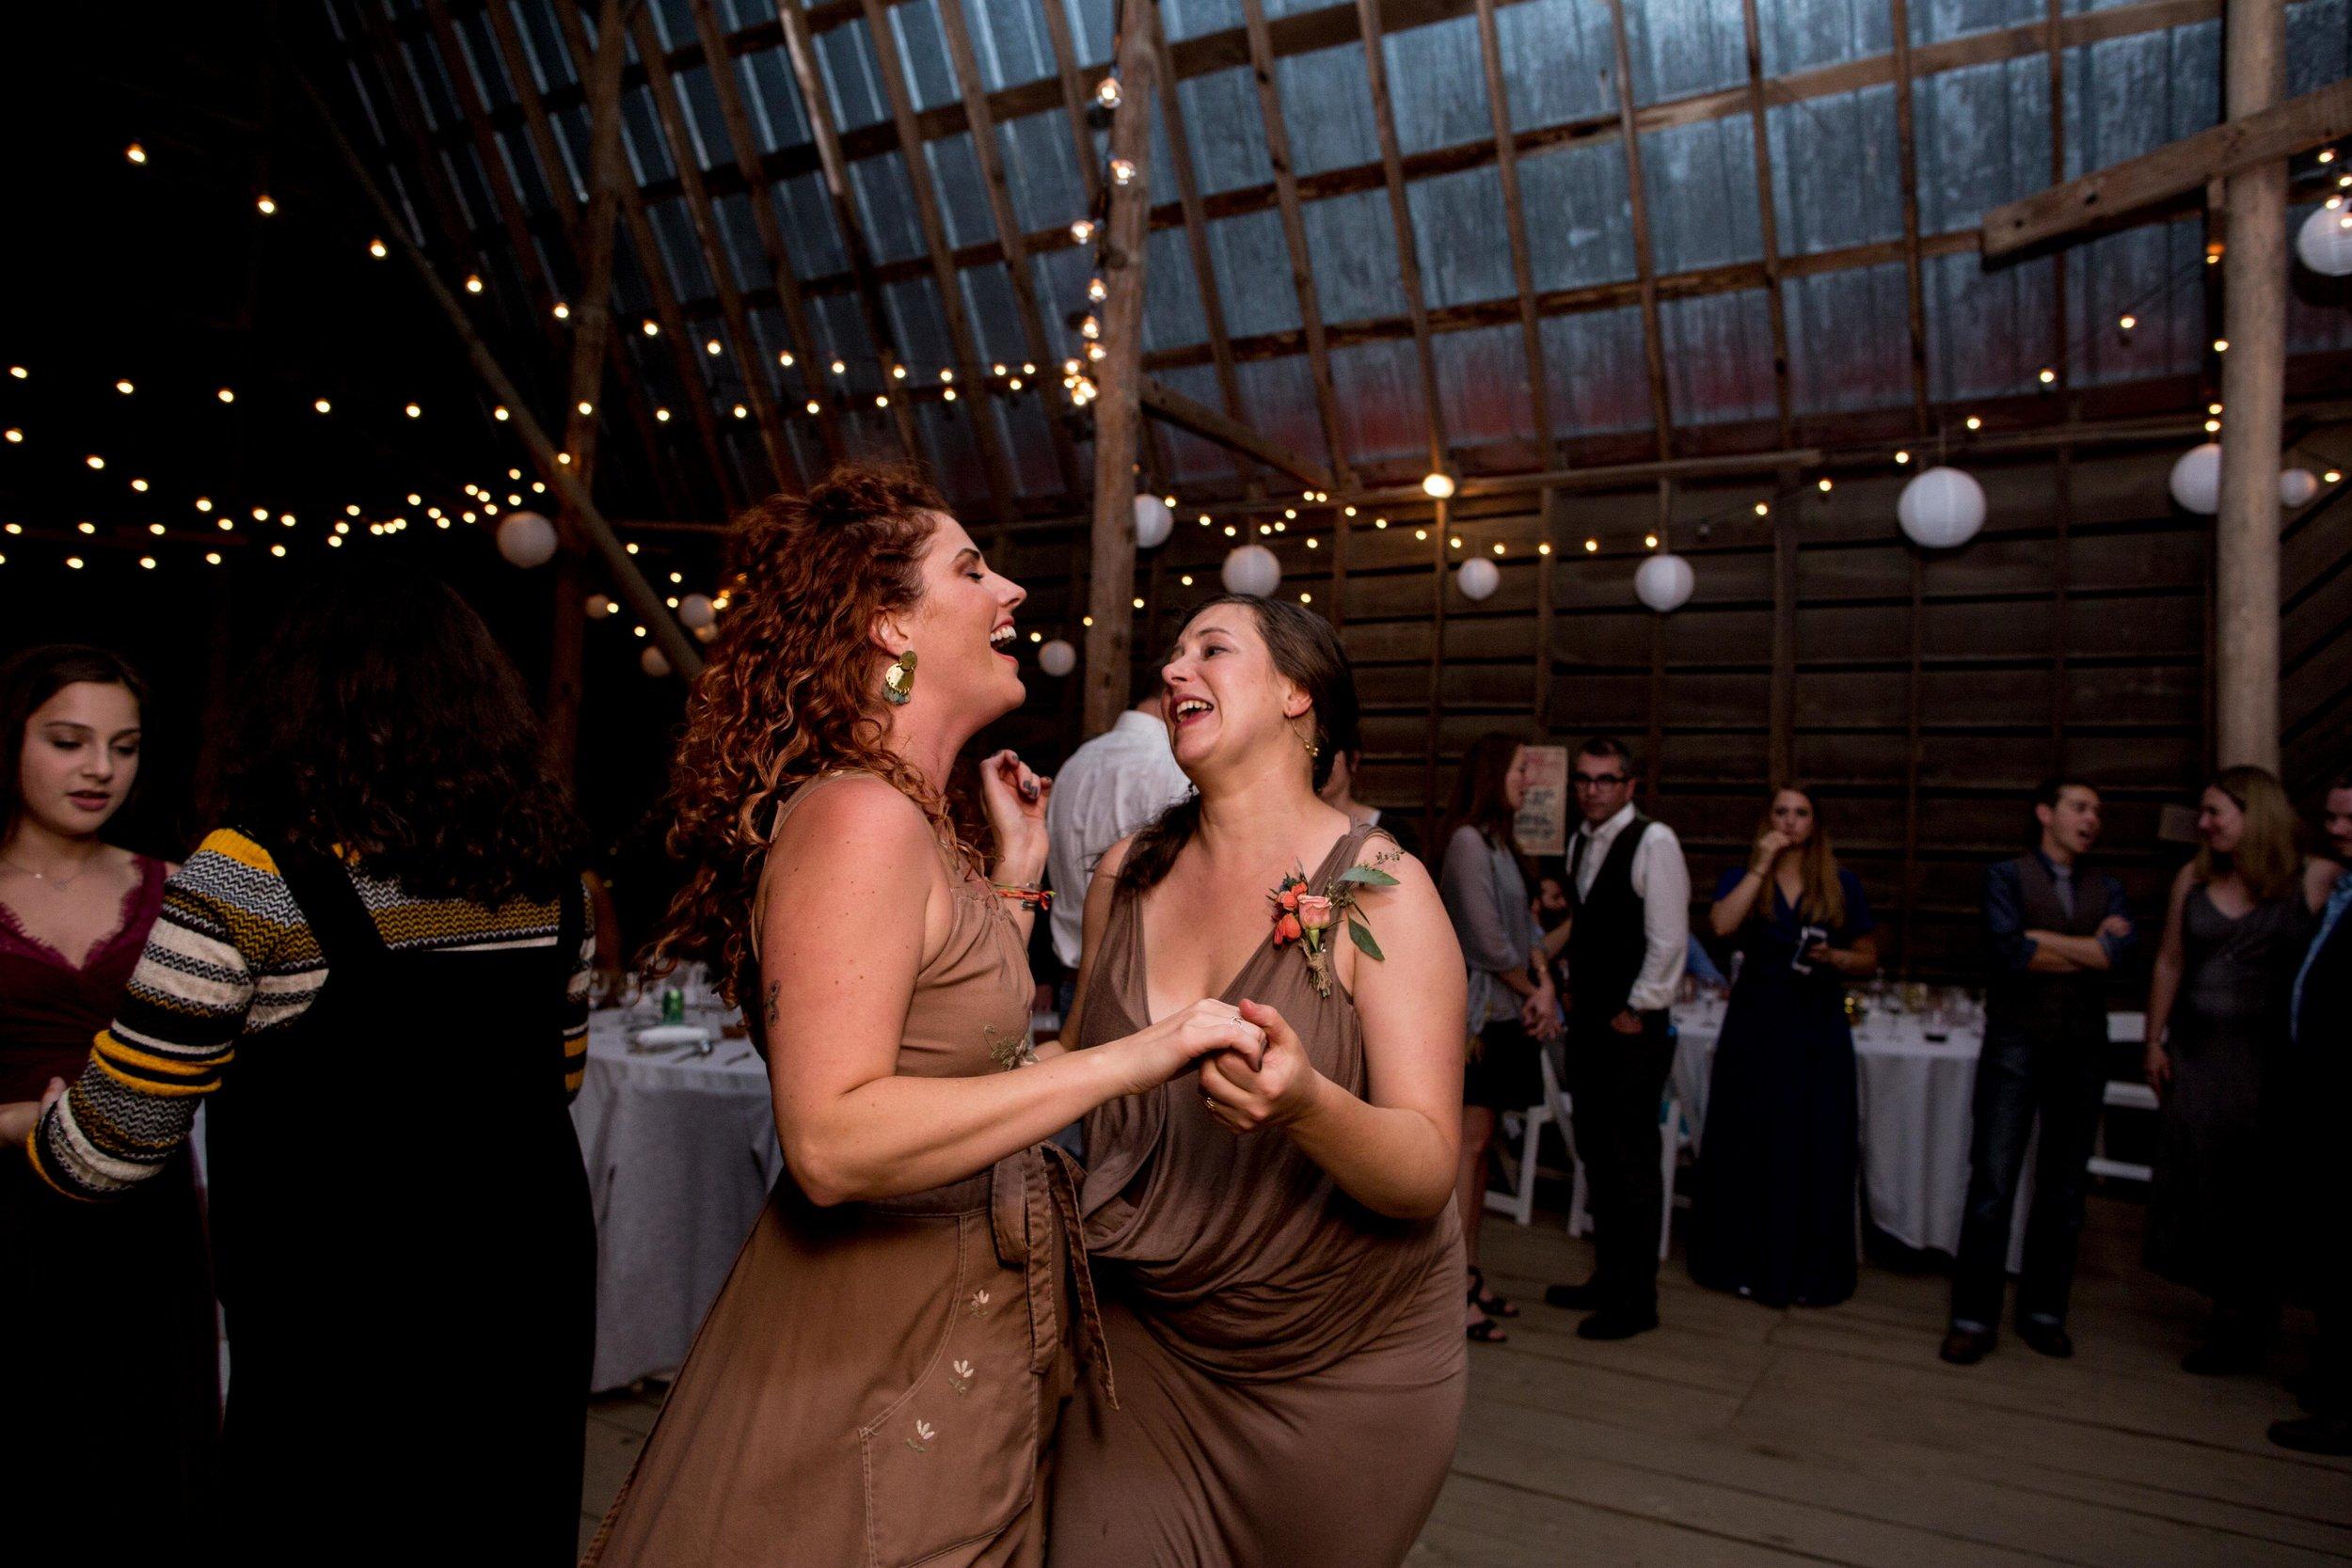 Jane Kramer + Jason Sandford Ashevegas wedding best photographer WNC -81.jpg